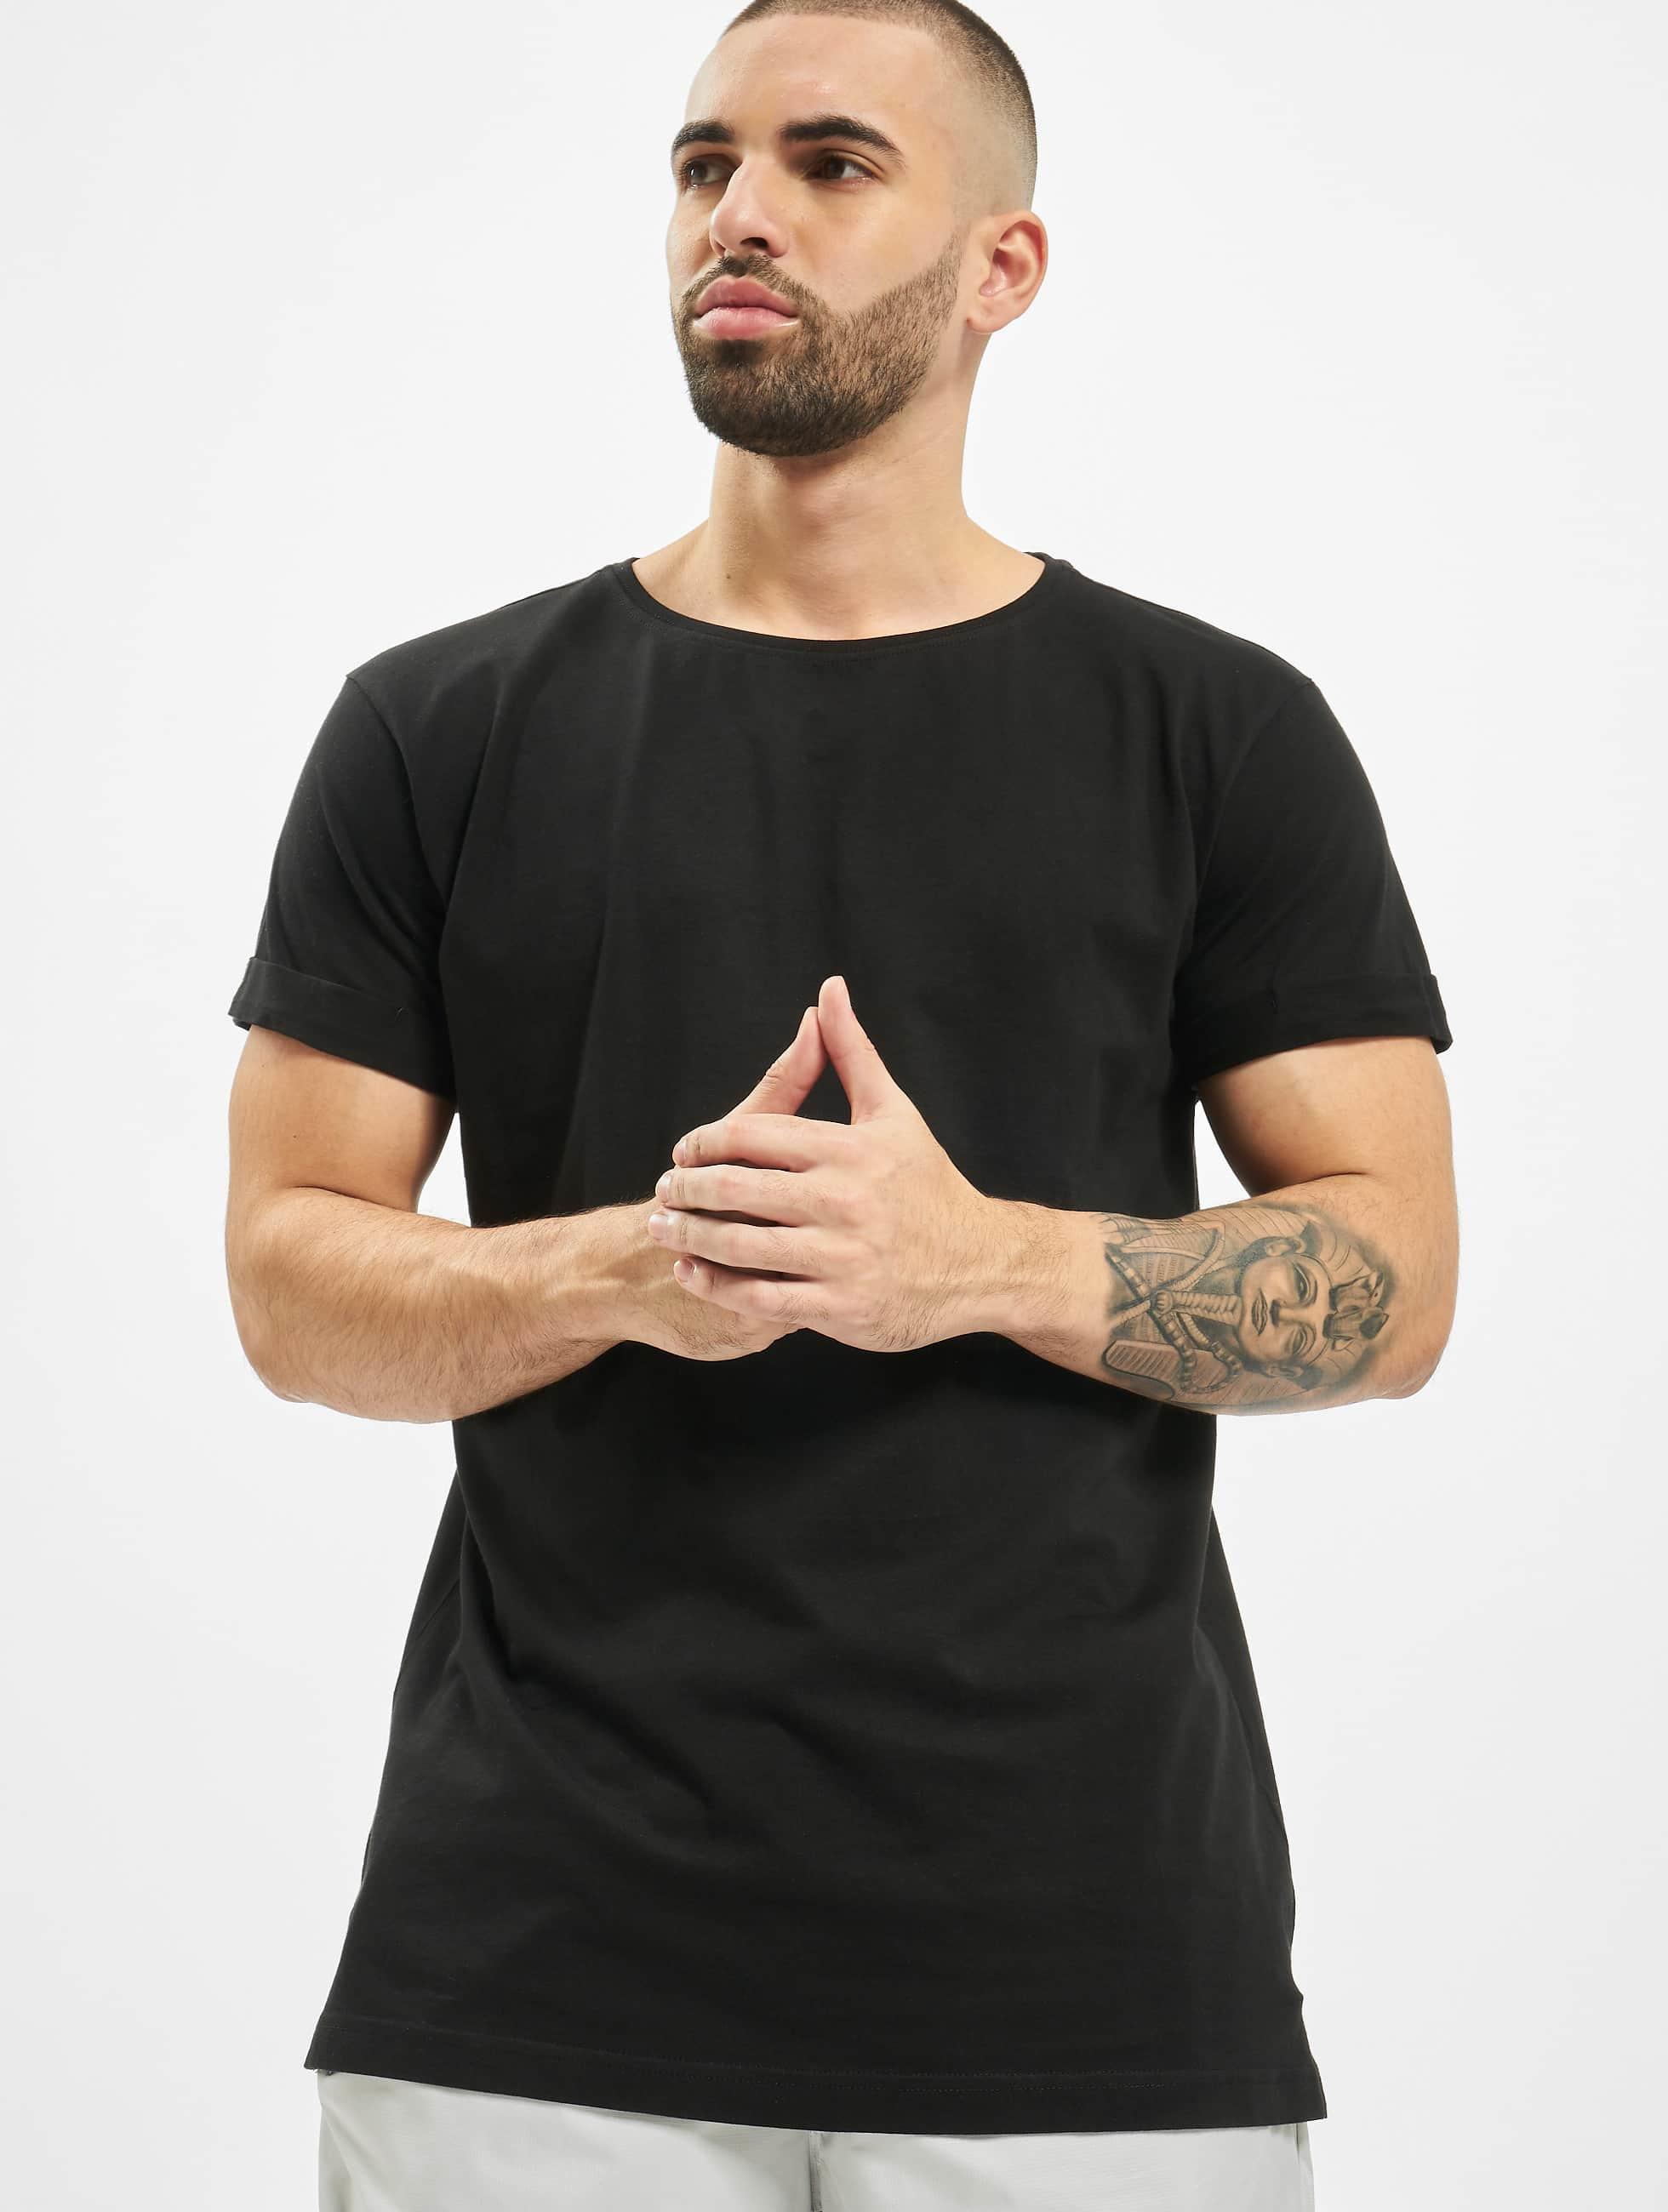 Urban Classics Turnup noir T-Shirt homme